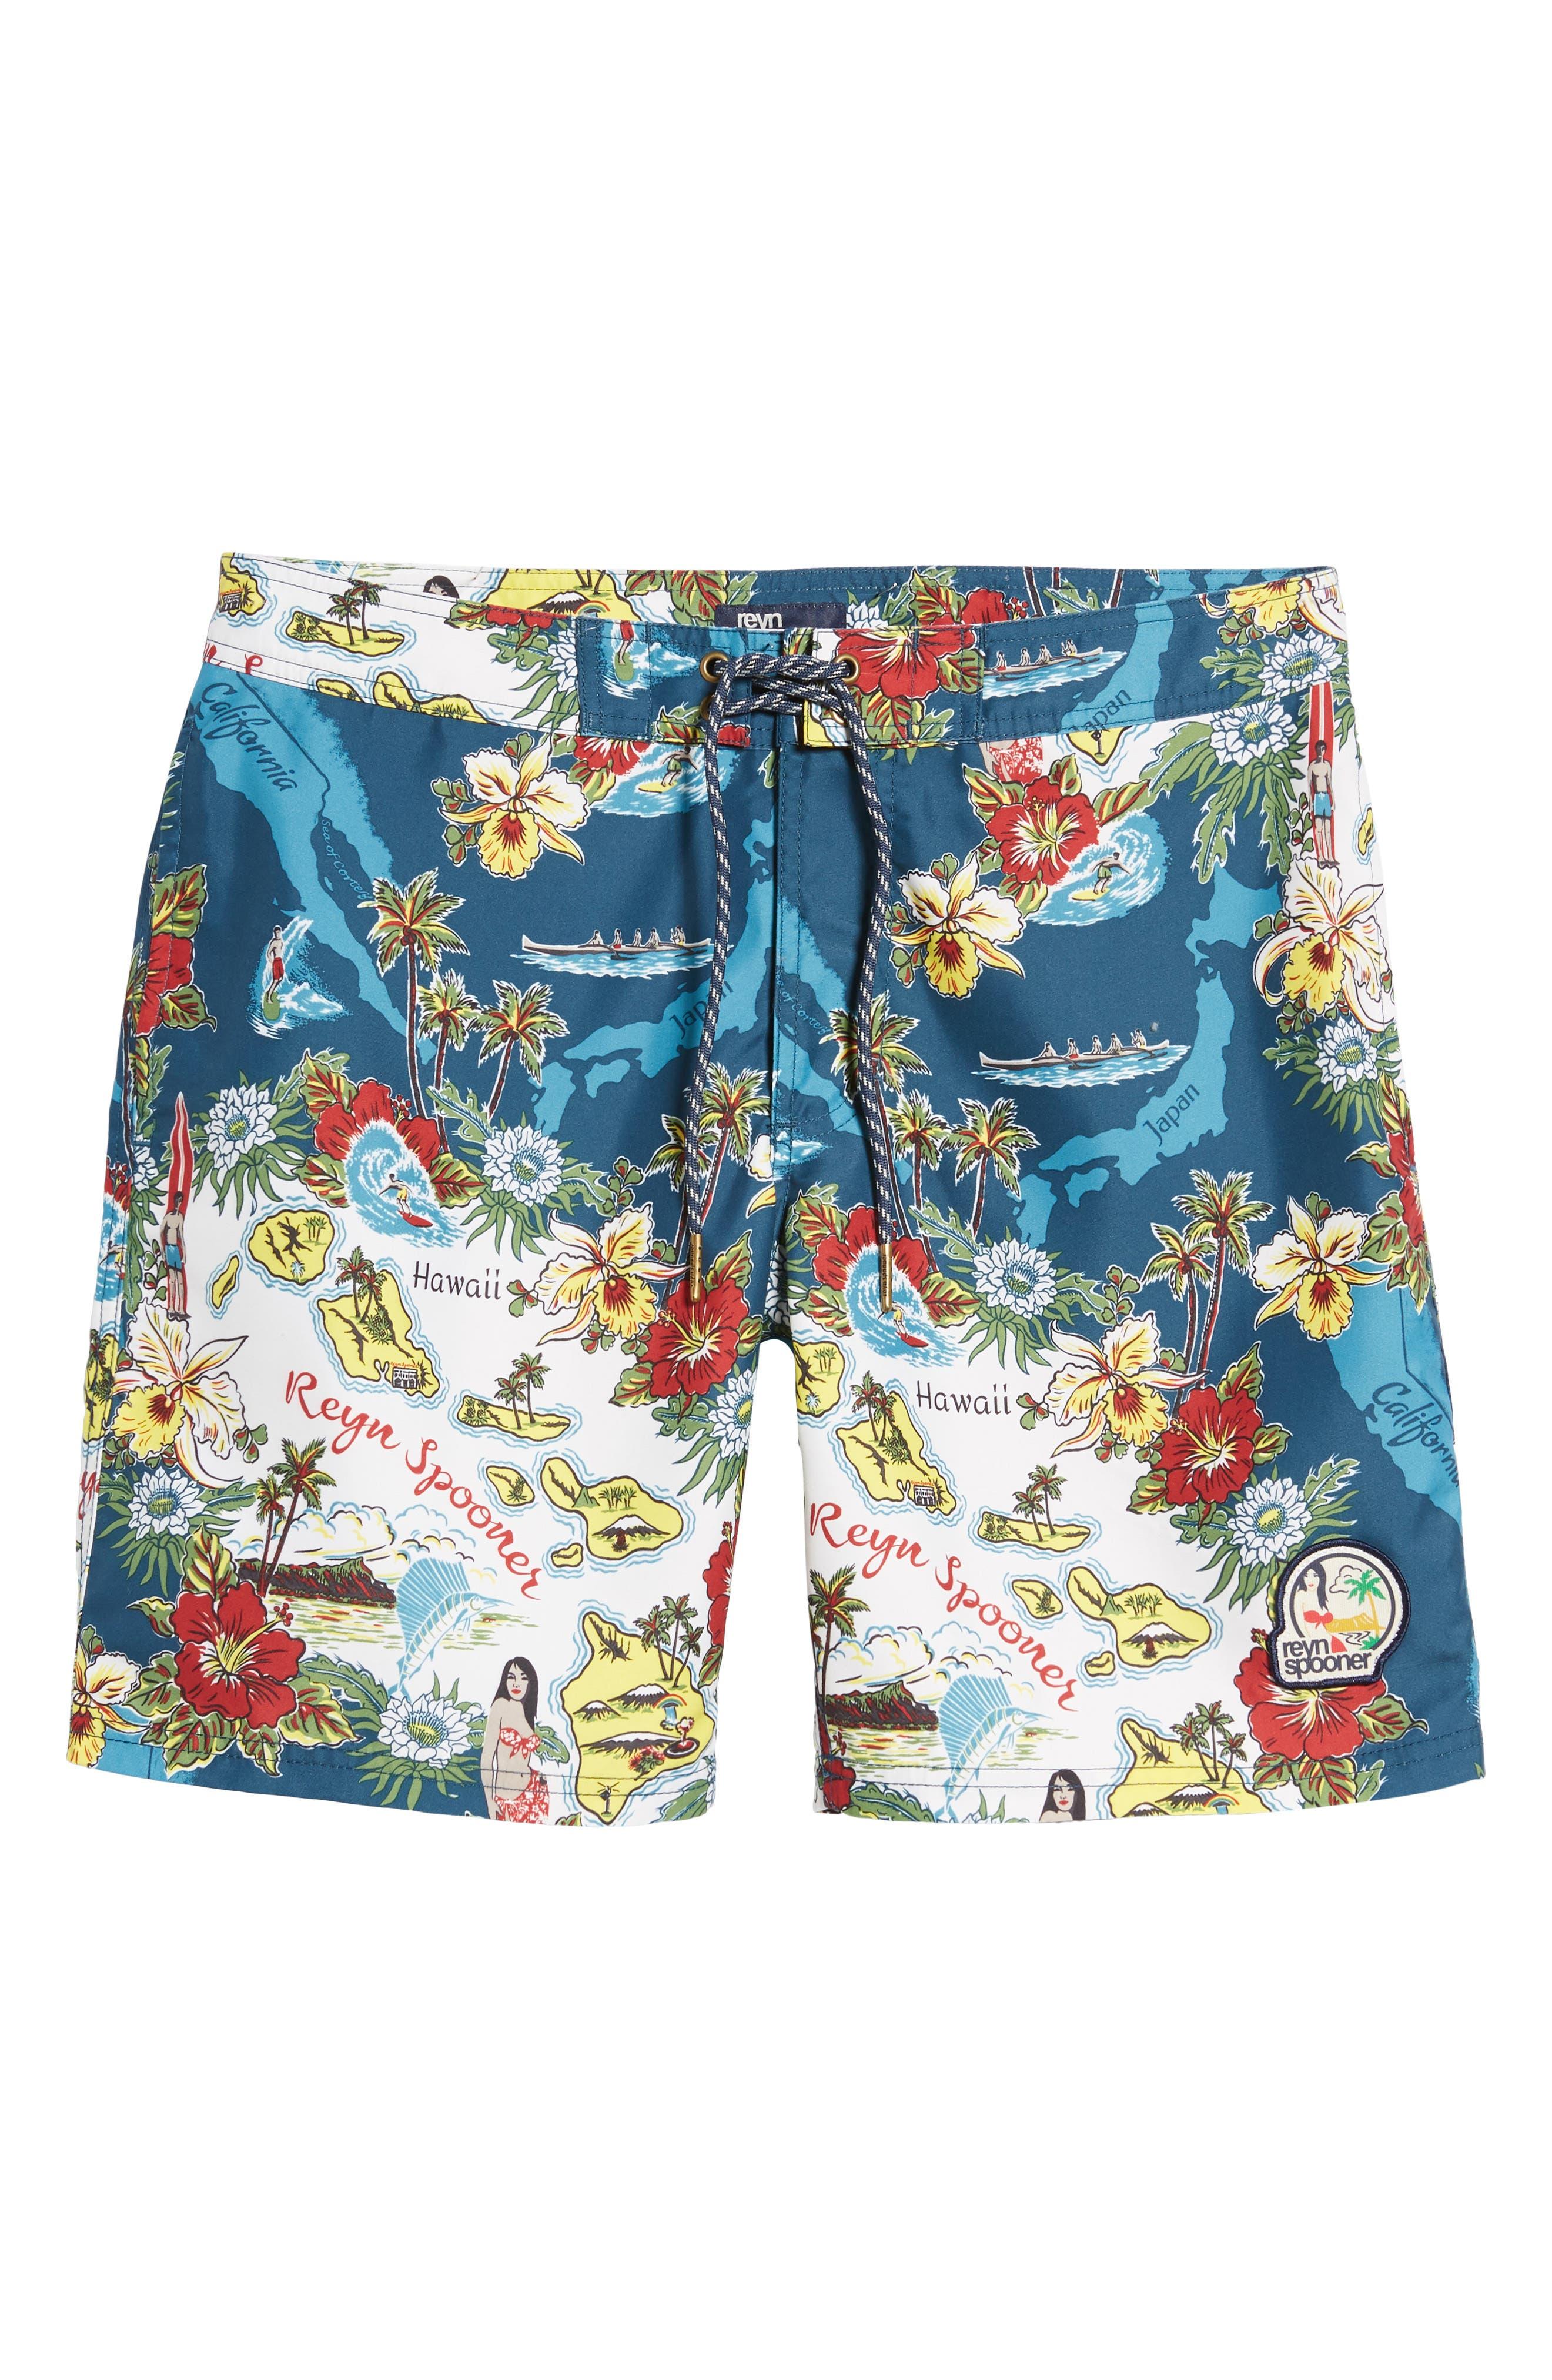 Status Oceanic Regular Fit Board Shorts,                             Alternate thumbnail 6, color,                             BLUE